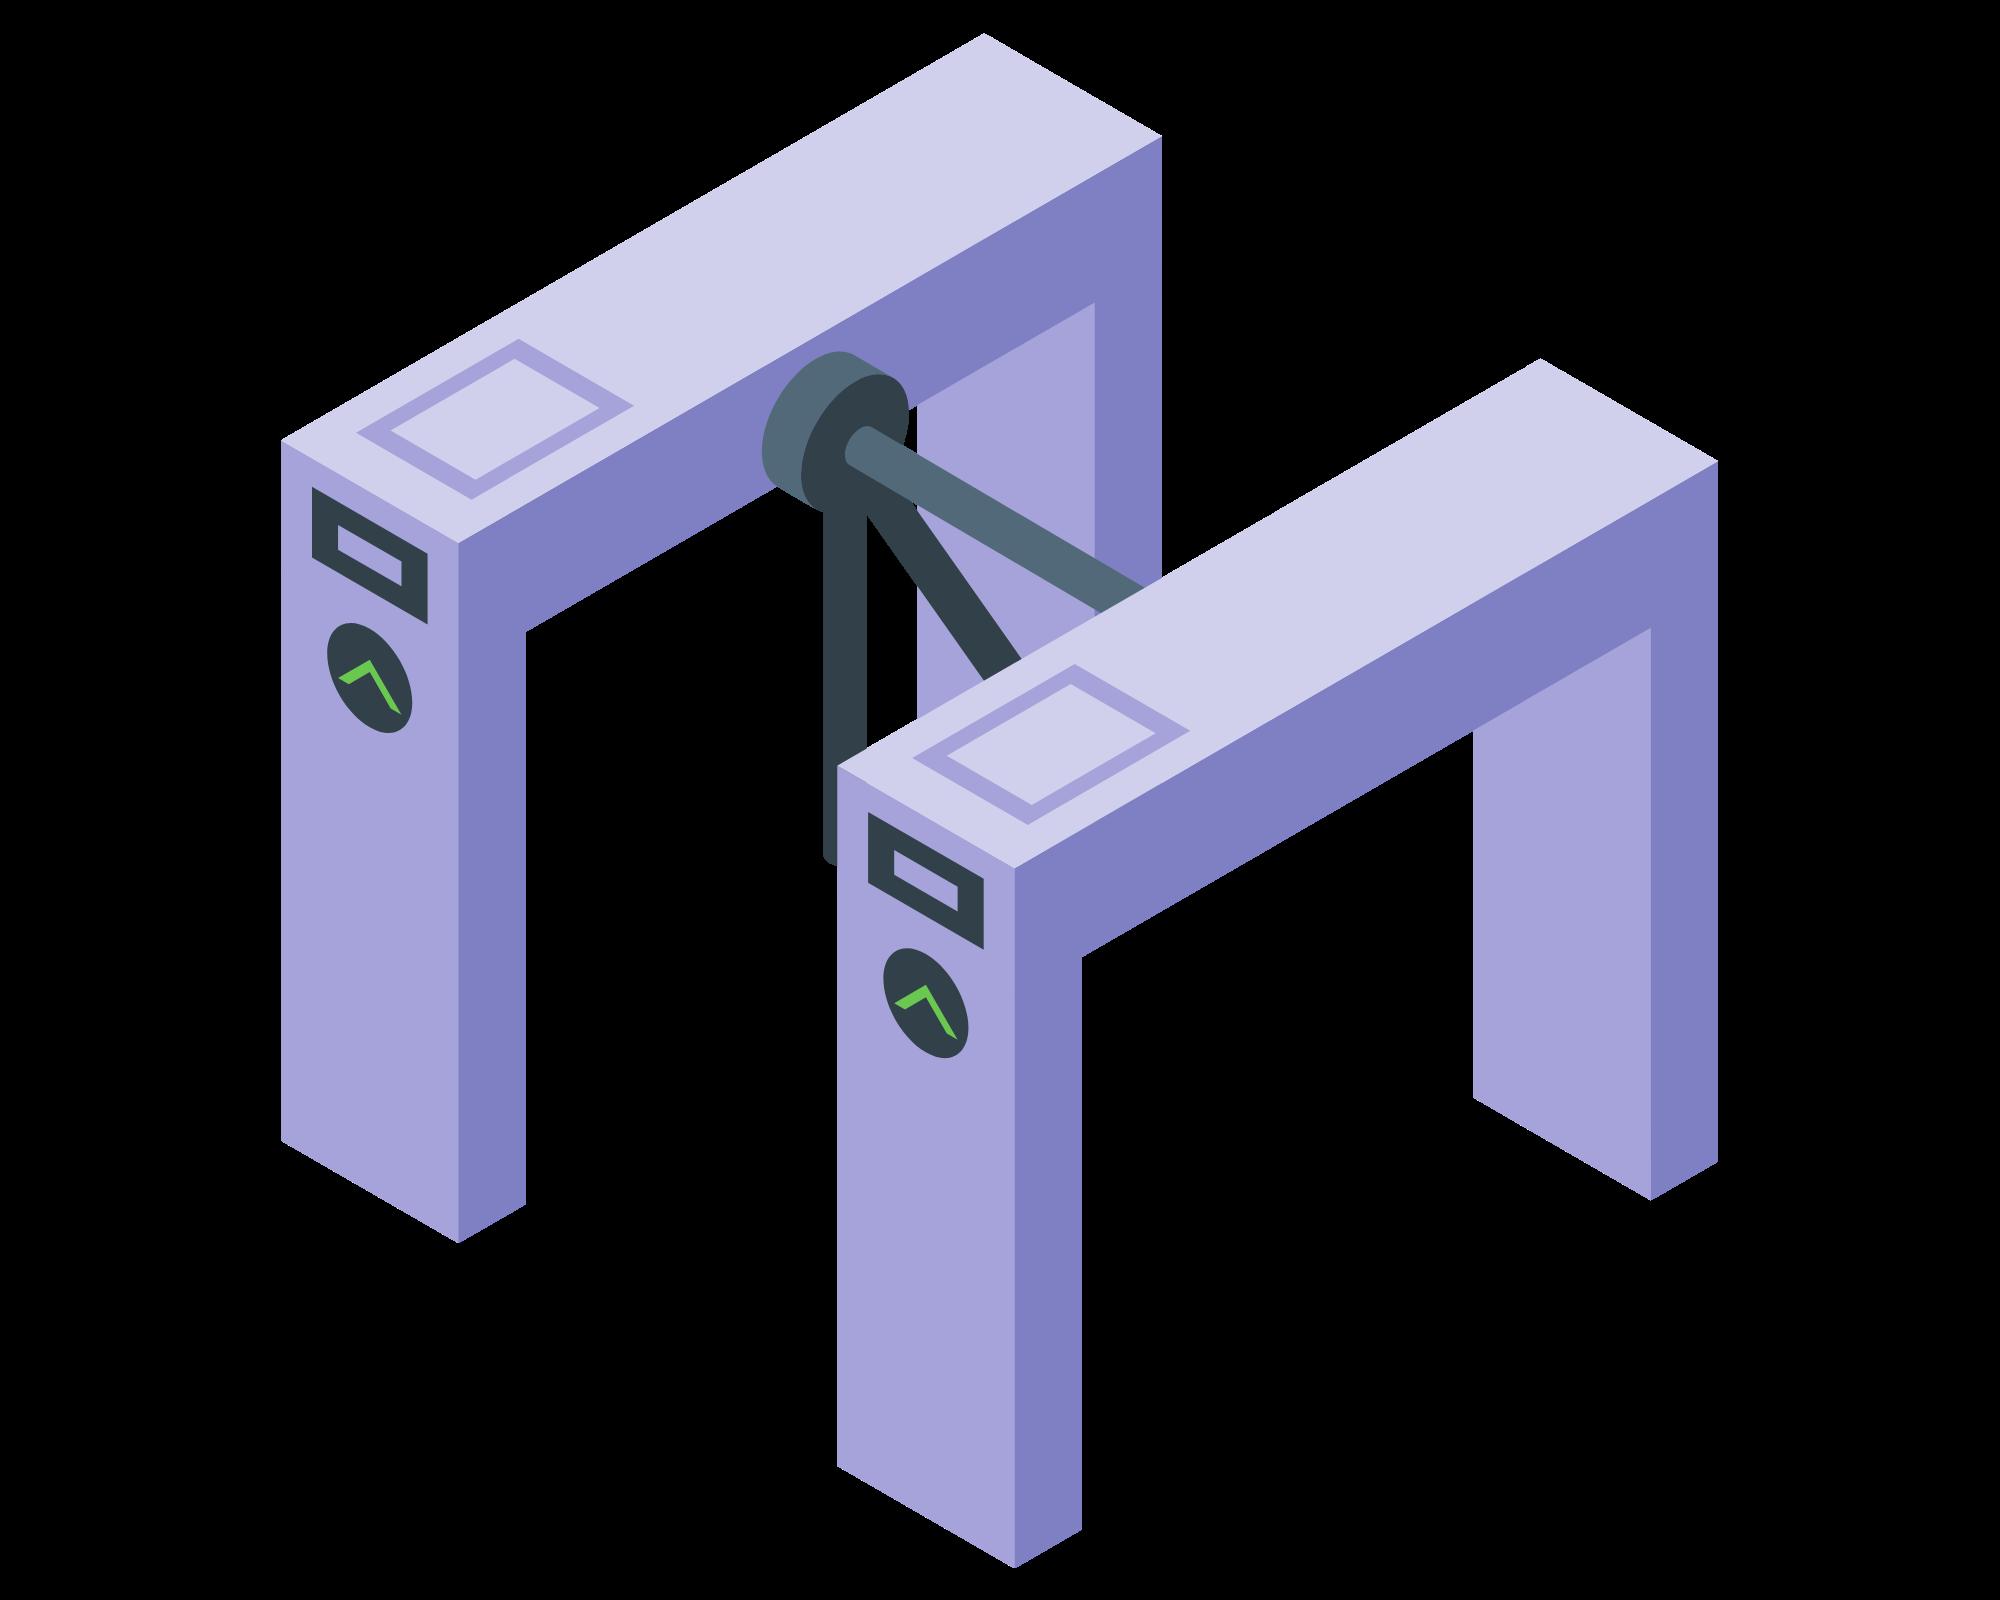 Construction site turnstiles